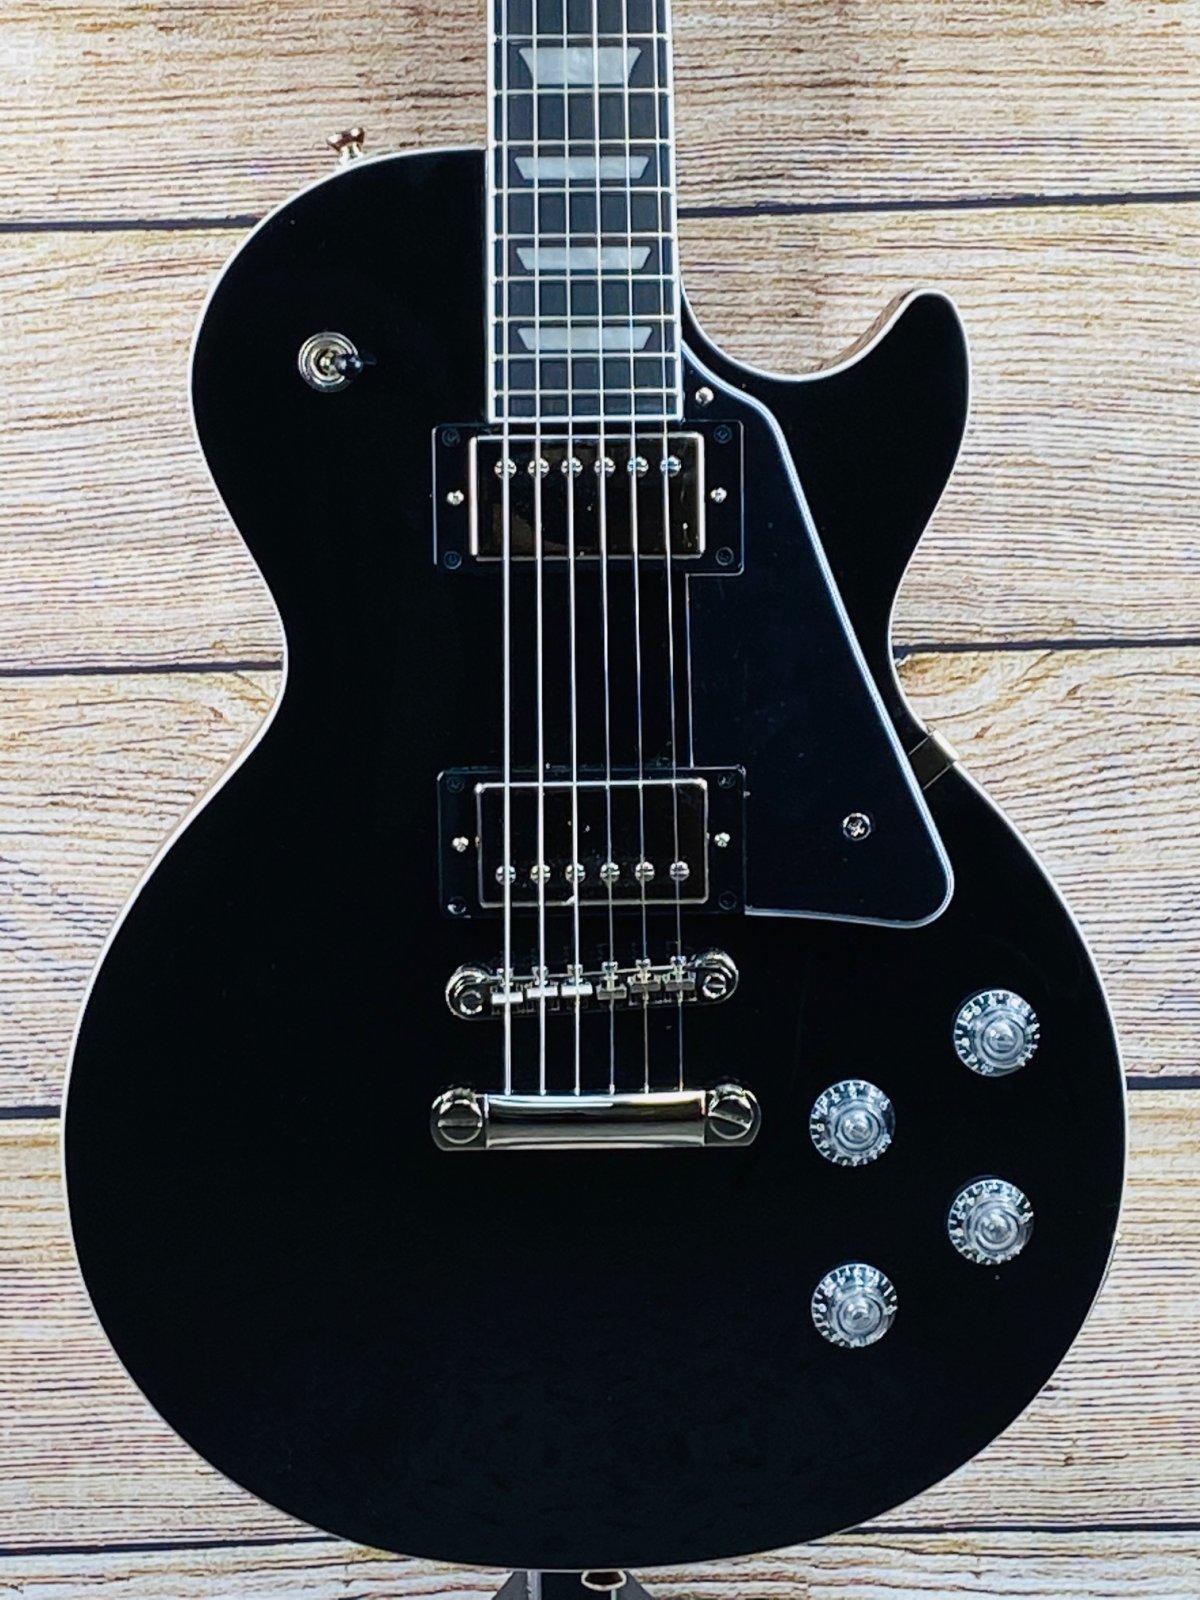 Epiphone Les Paul Modern Electric Guitar - Graphite Black